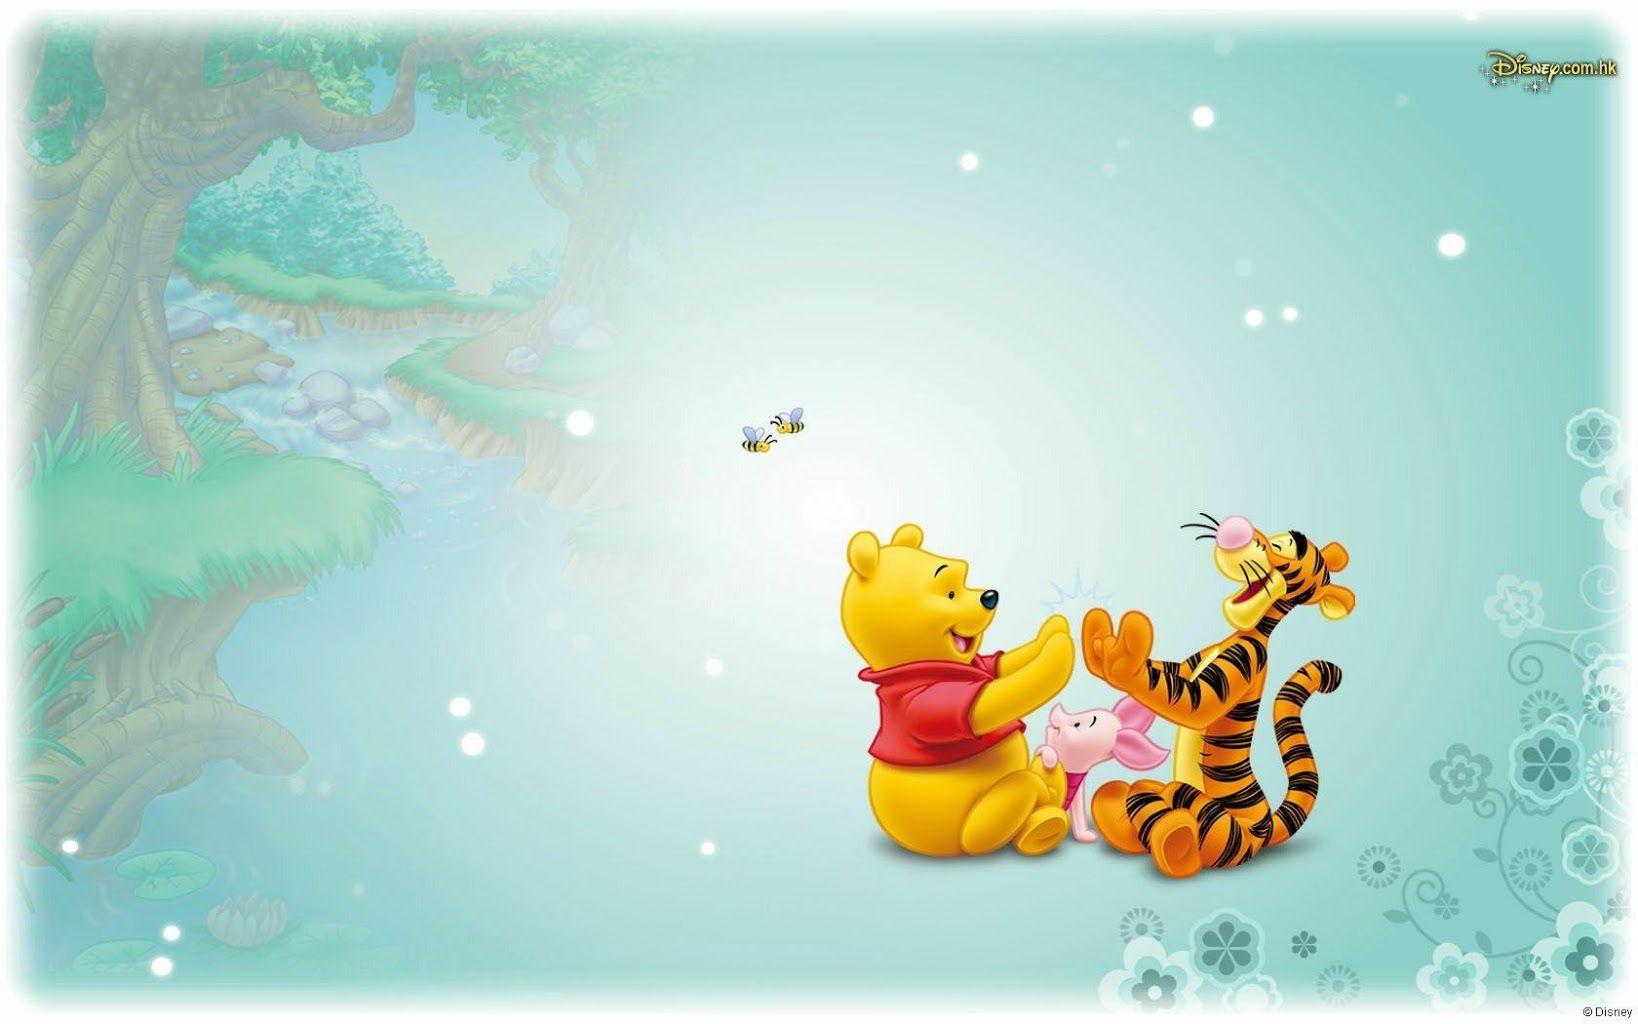 Disney winnie pooh wallpaper download disney winnie pooh hd disney winnie pooh wallpaper download disney winnie pooh voltagebd Image collections